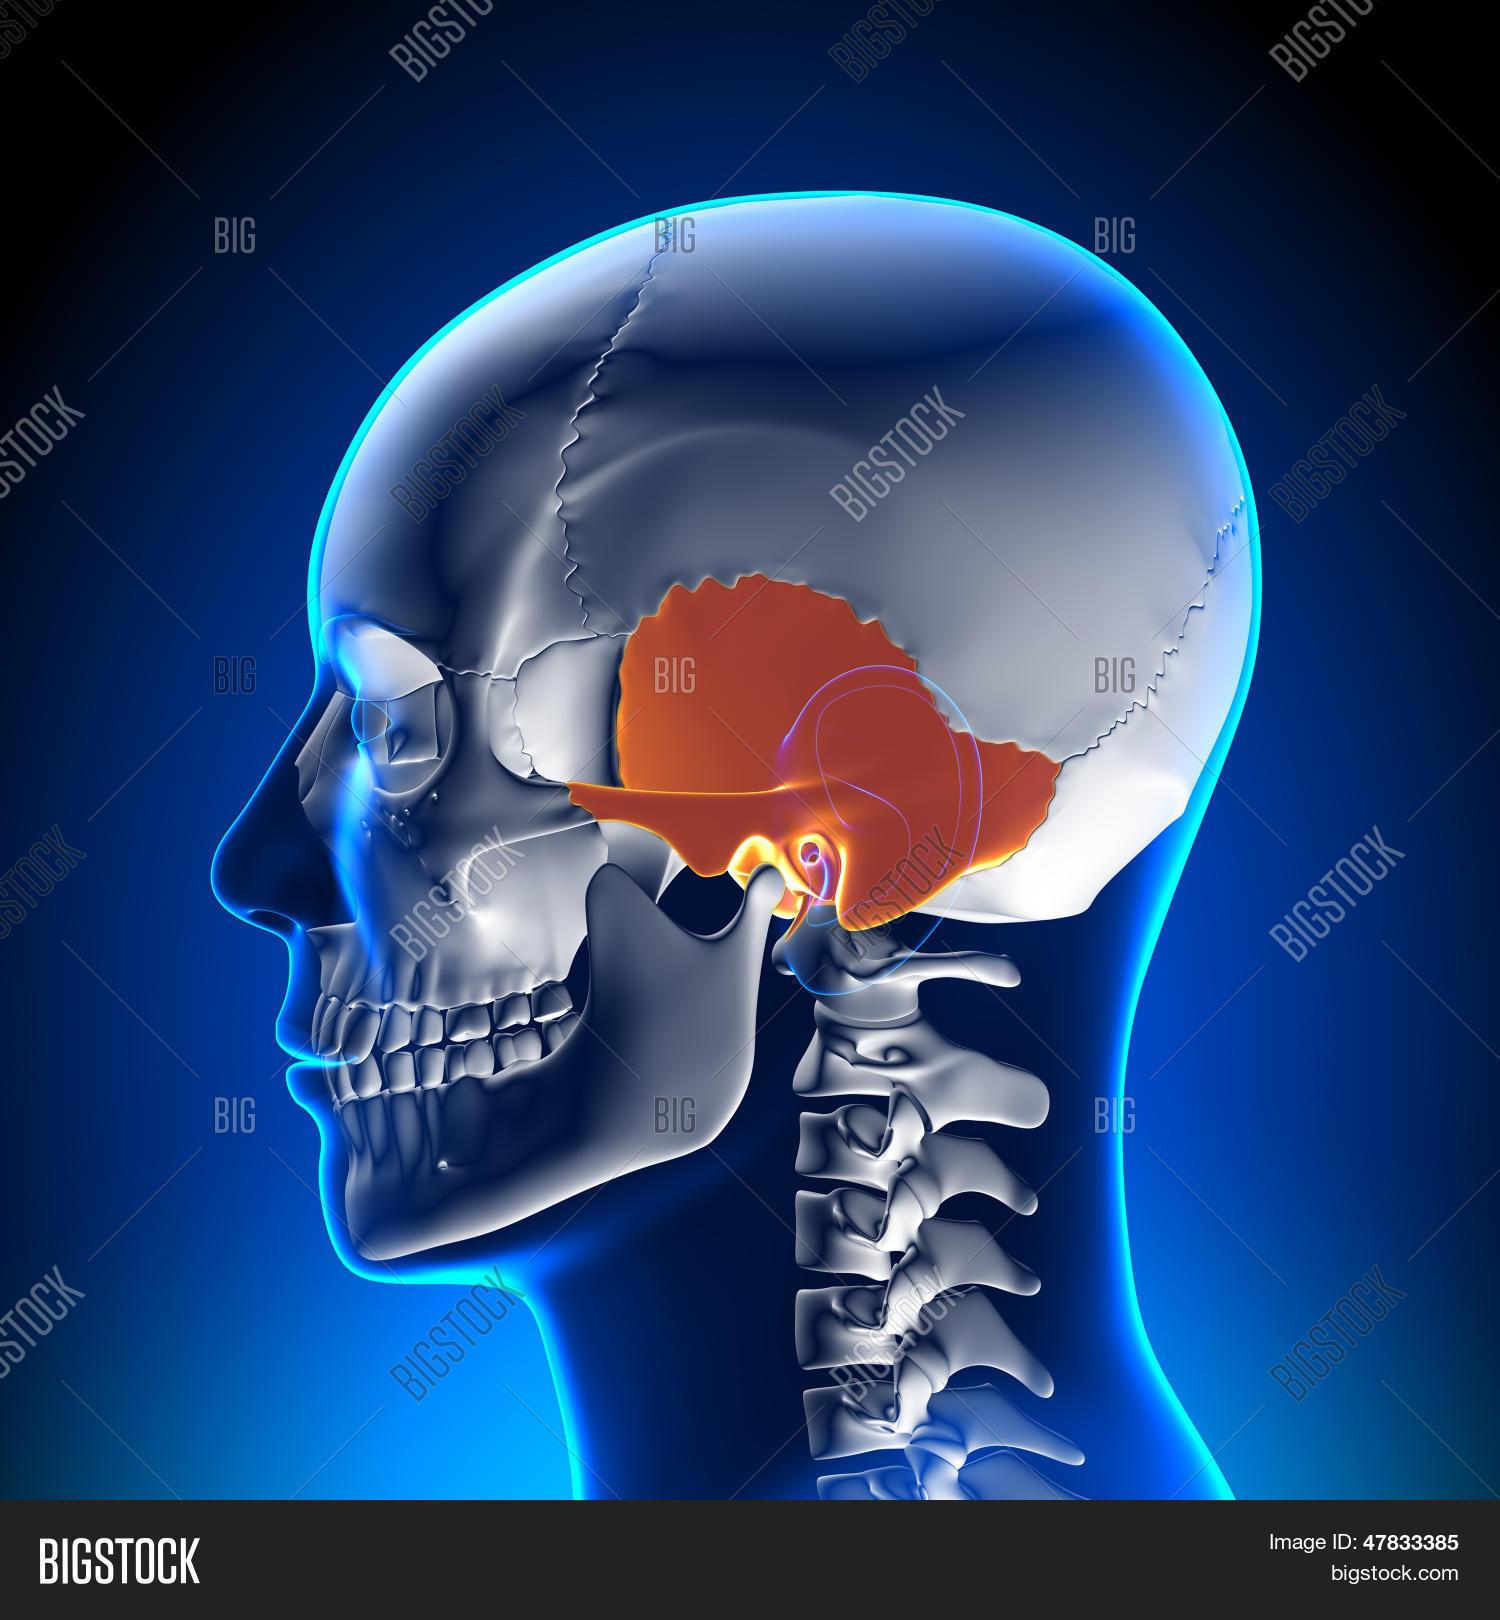 Brain Anatomy - Image & Photo (Free Trial) | Bigstock